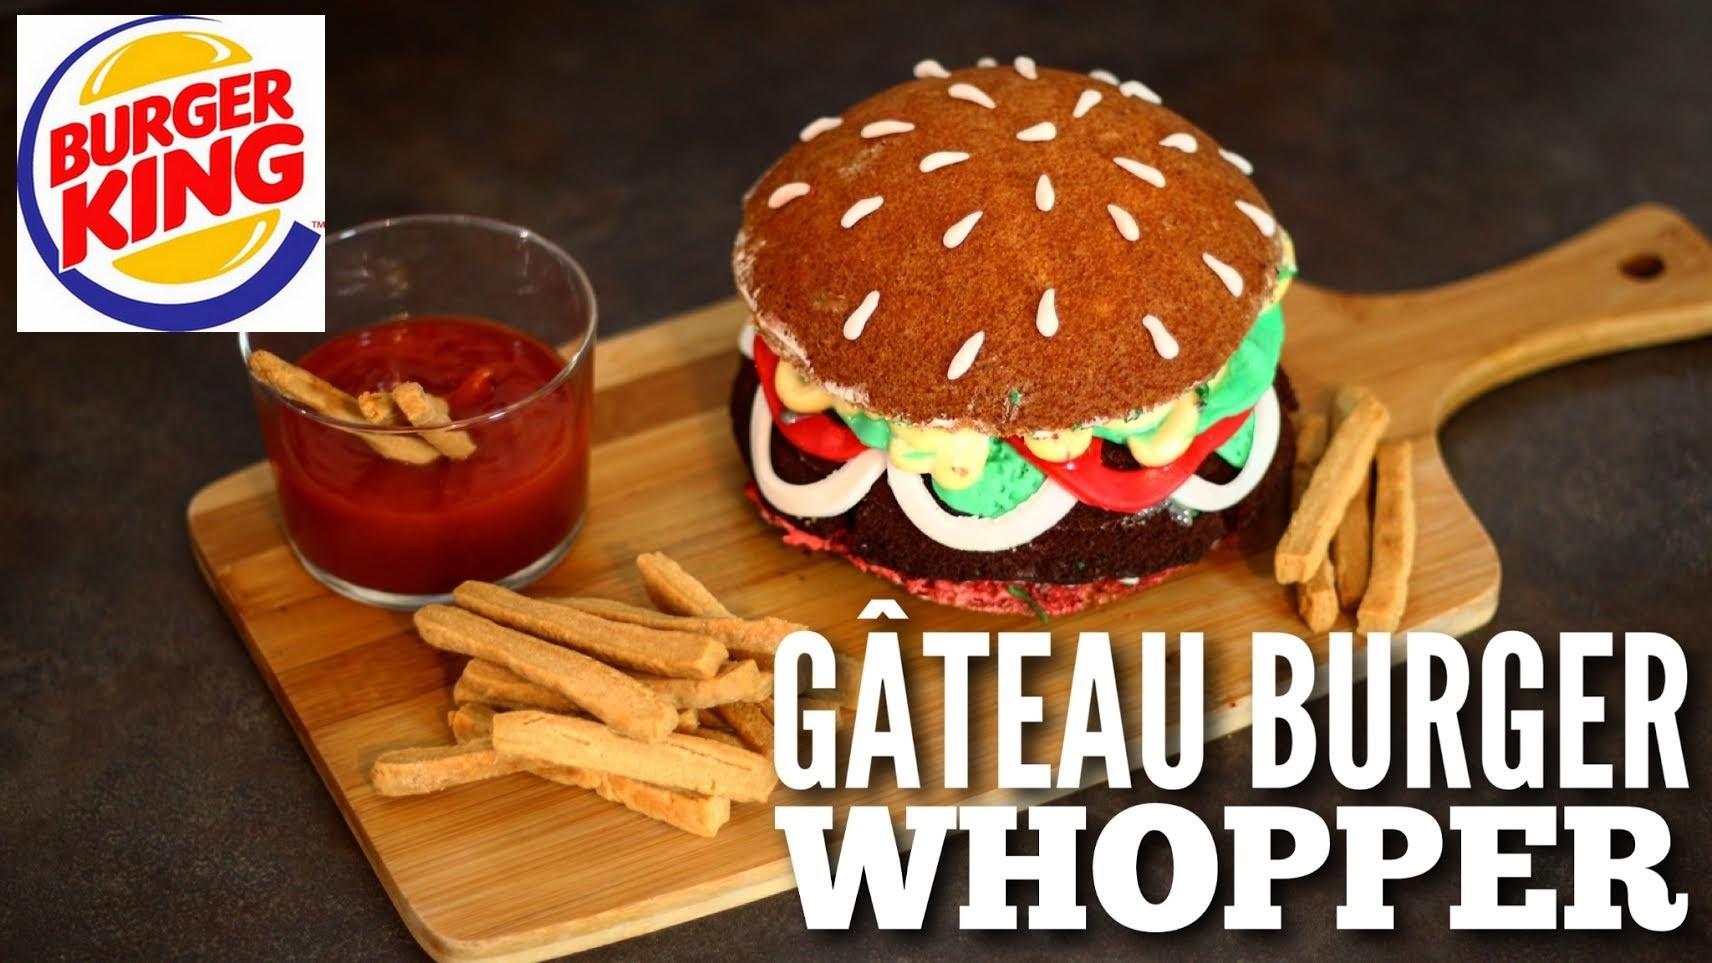 RECETTE GATEAU BURGER WHOPPER BURGER KING | BURGER CAKE | CAKE  DESIGN